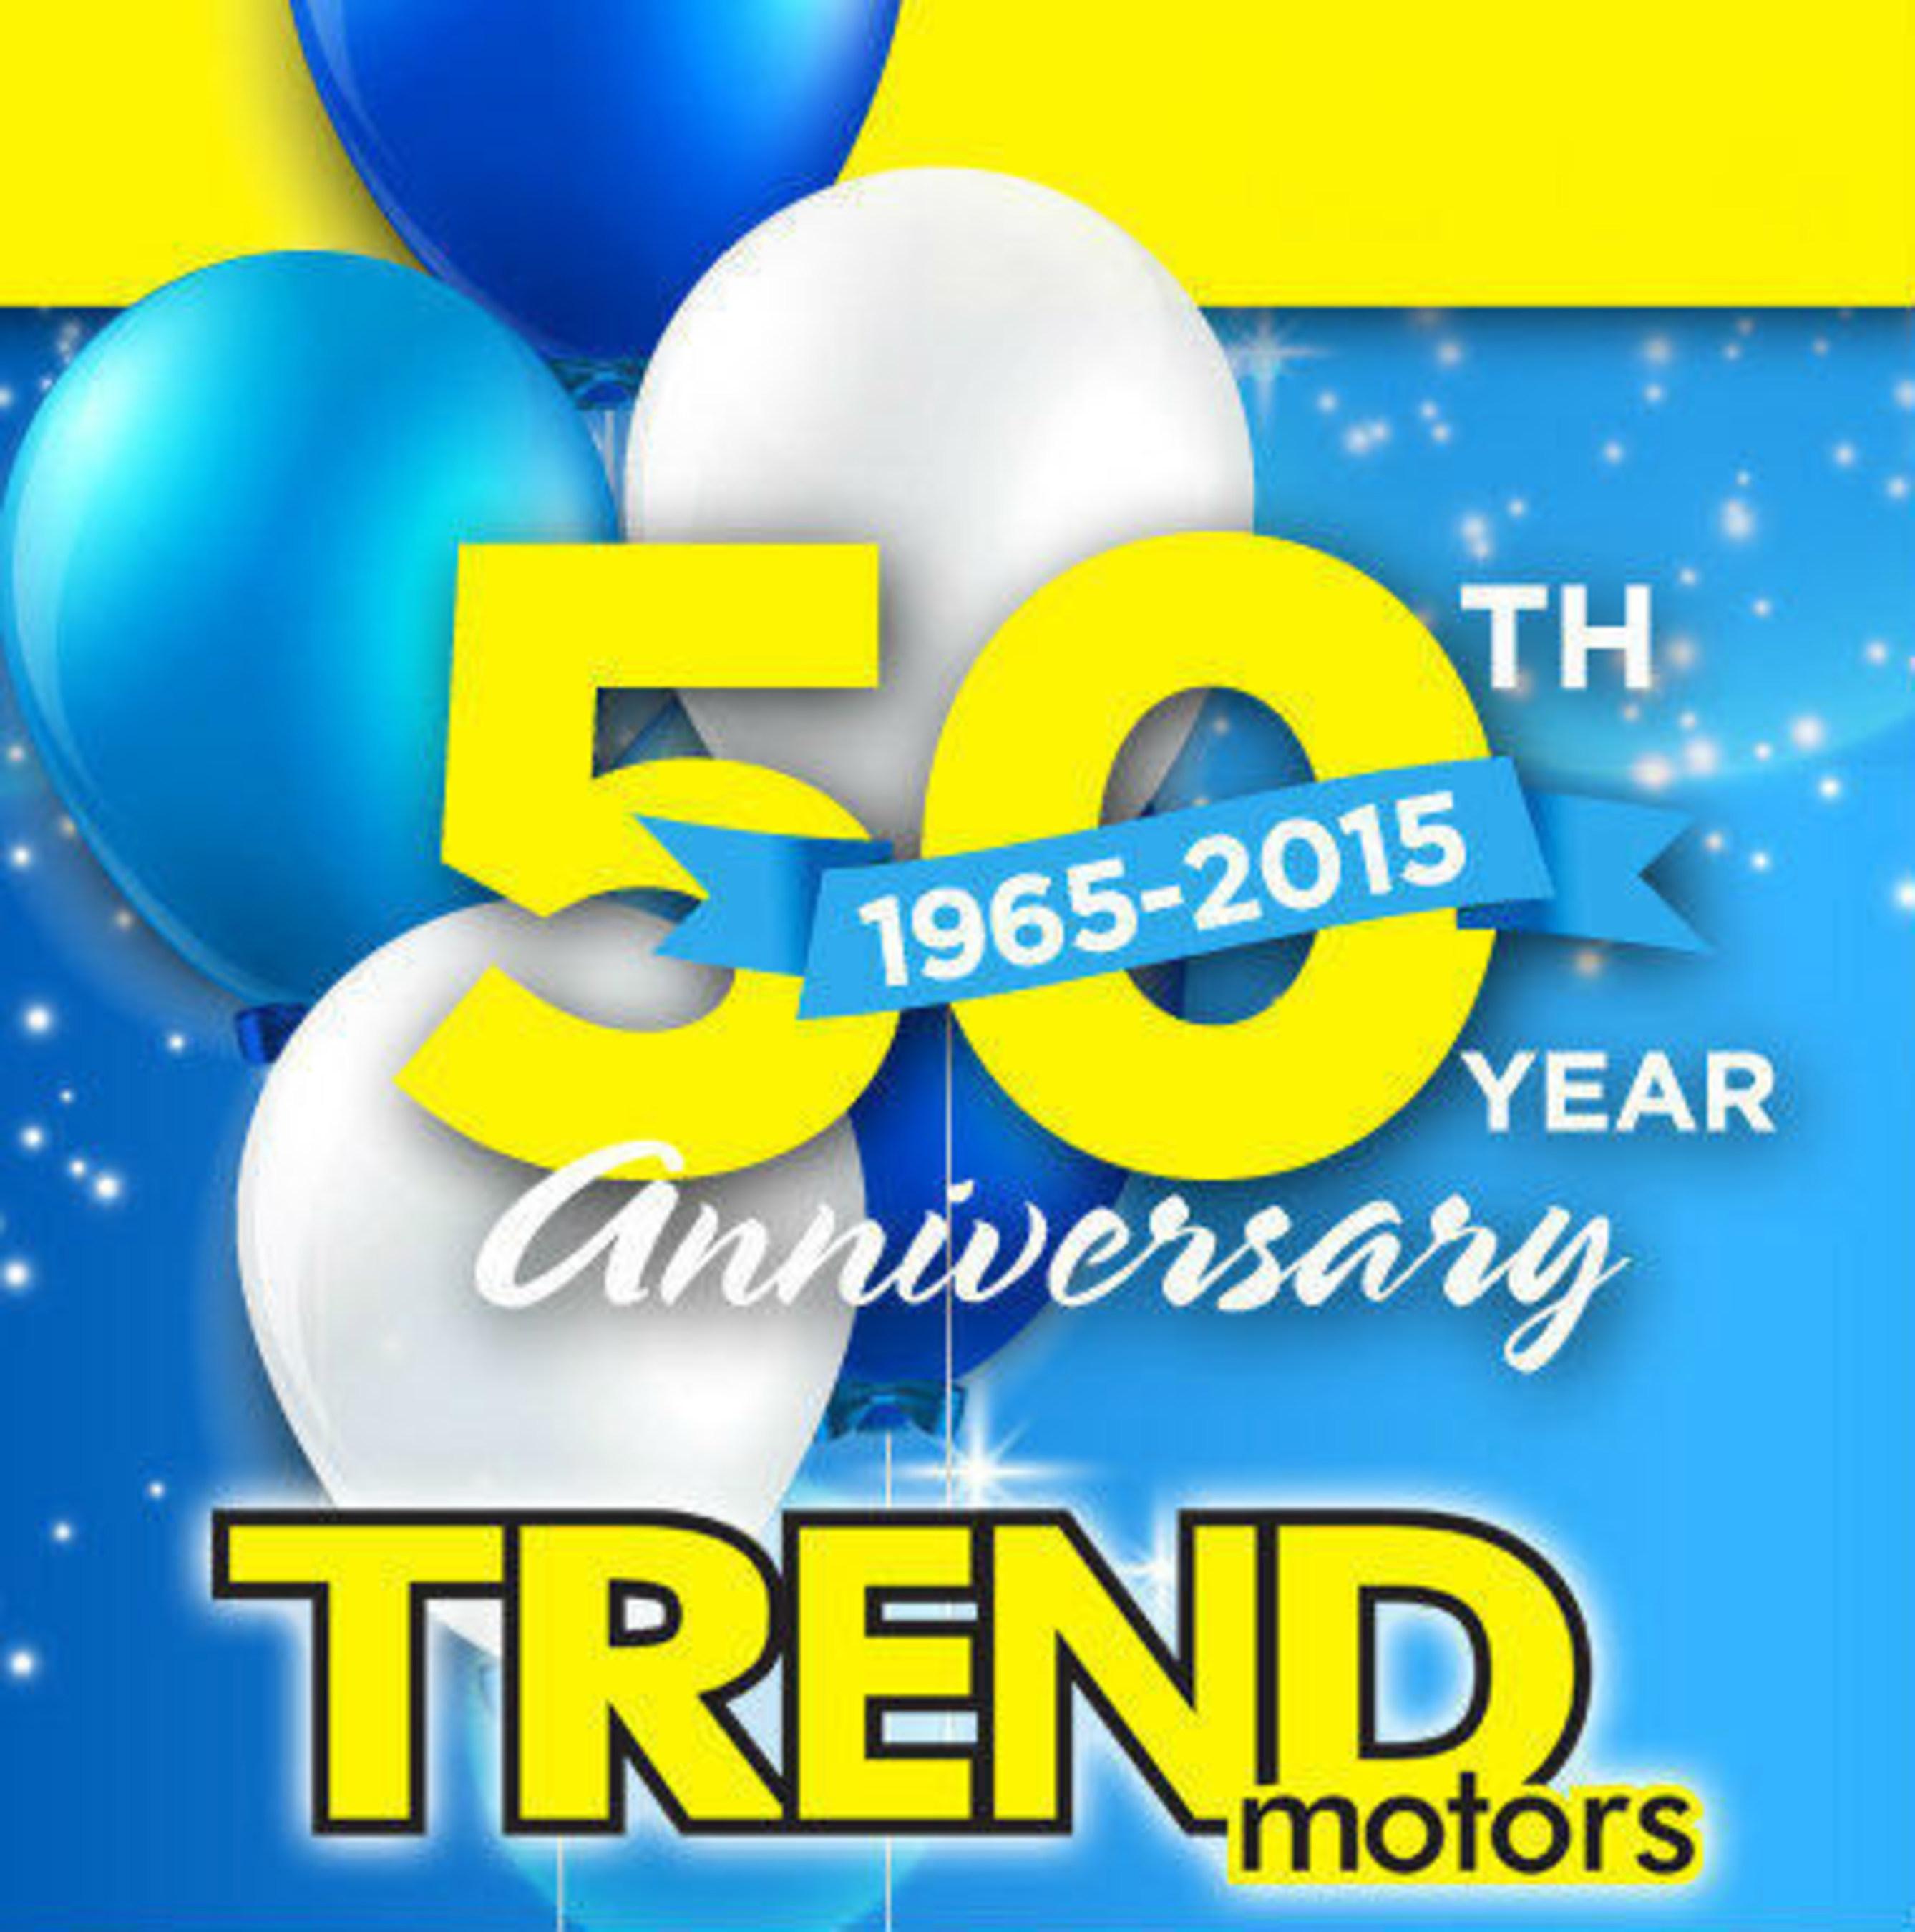 Rockaway-area dealership celebrates 50th anniversary